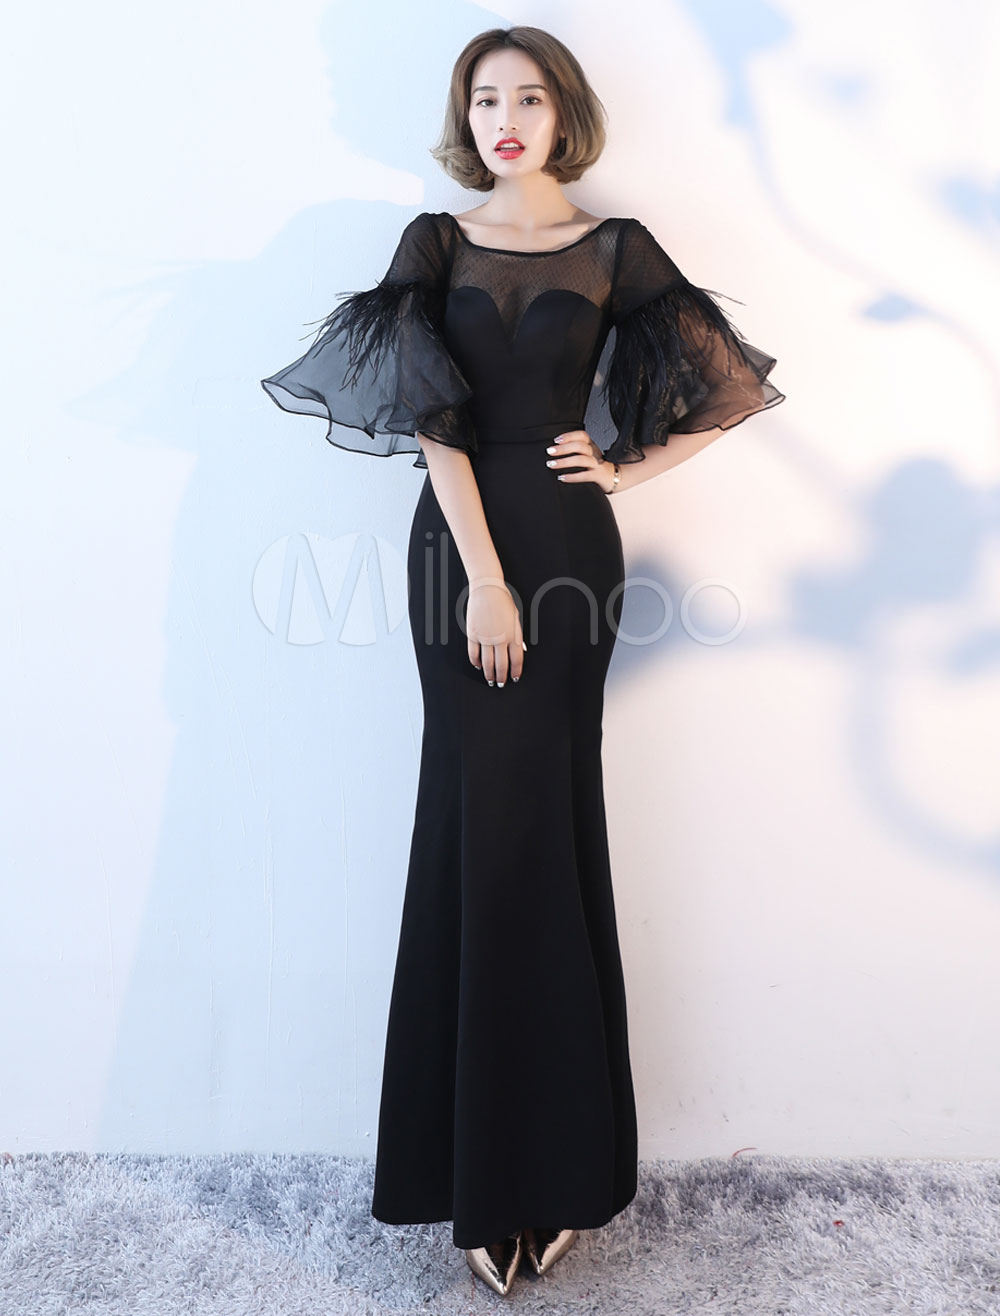 Black Evening Dresses Long Bell Sleeve Illusion Satin Mermaid Formal Dress